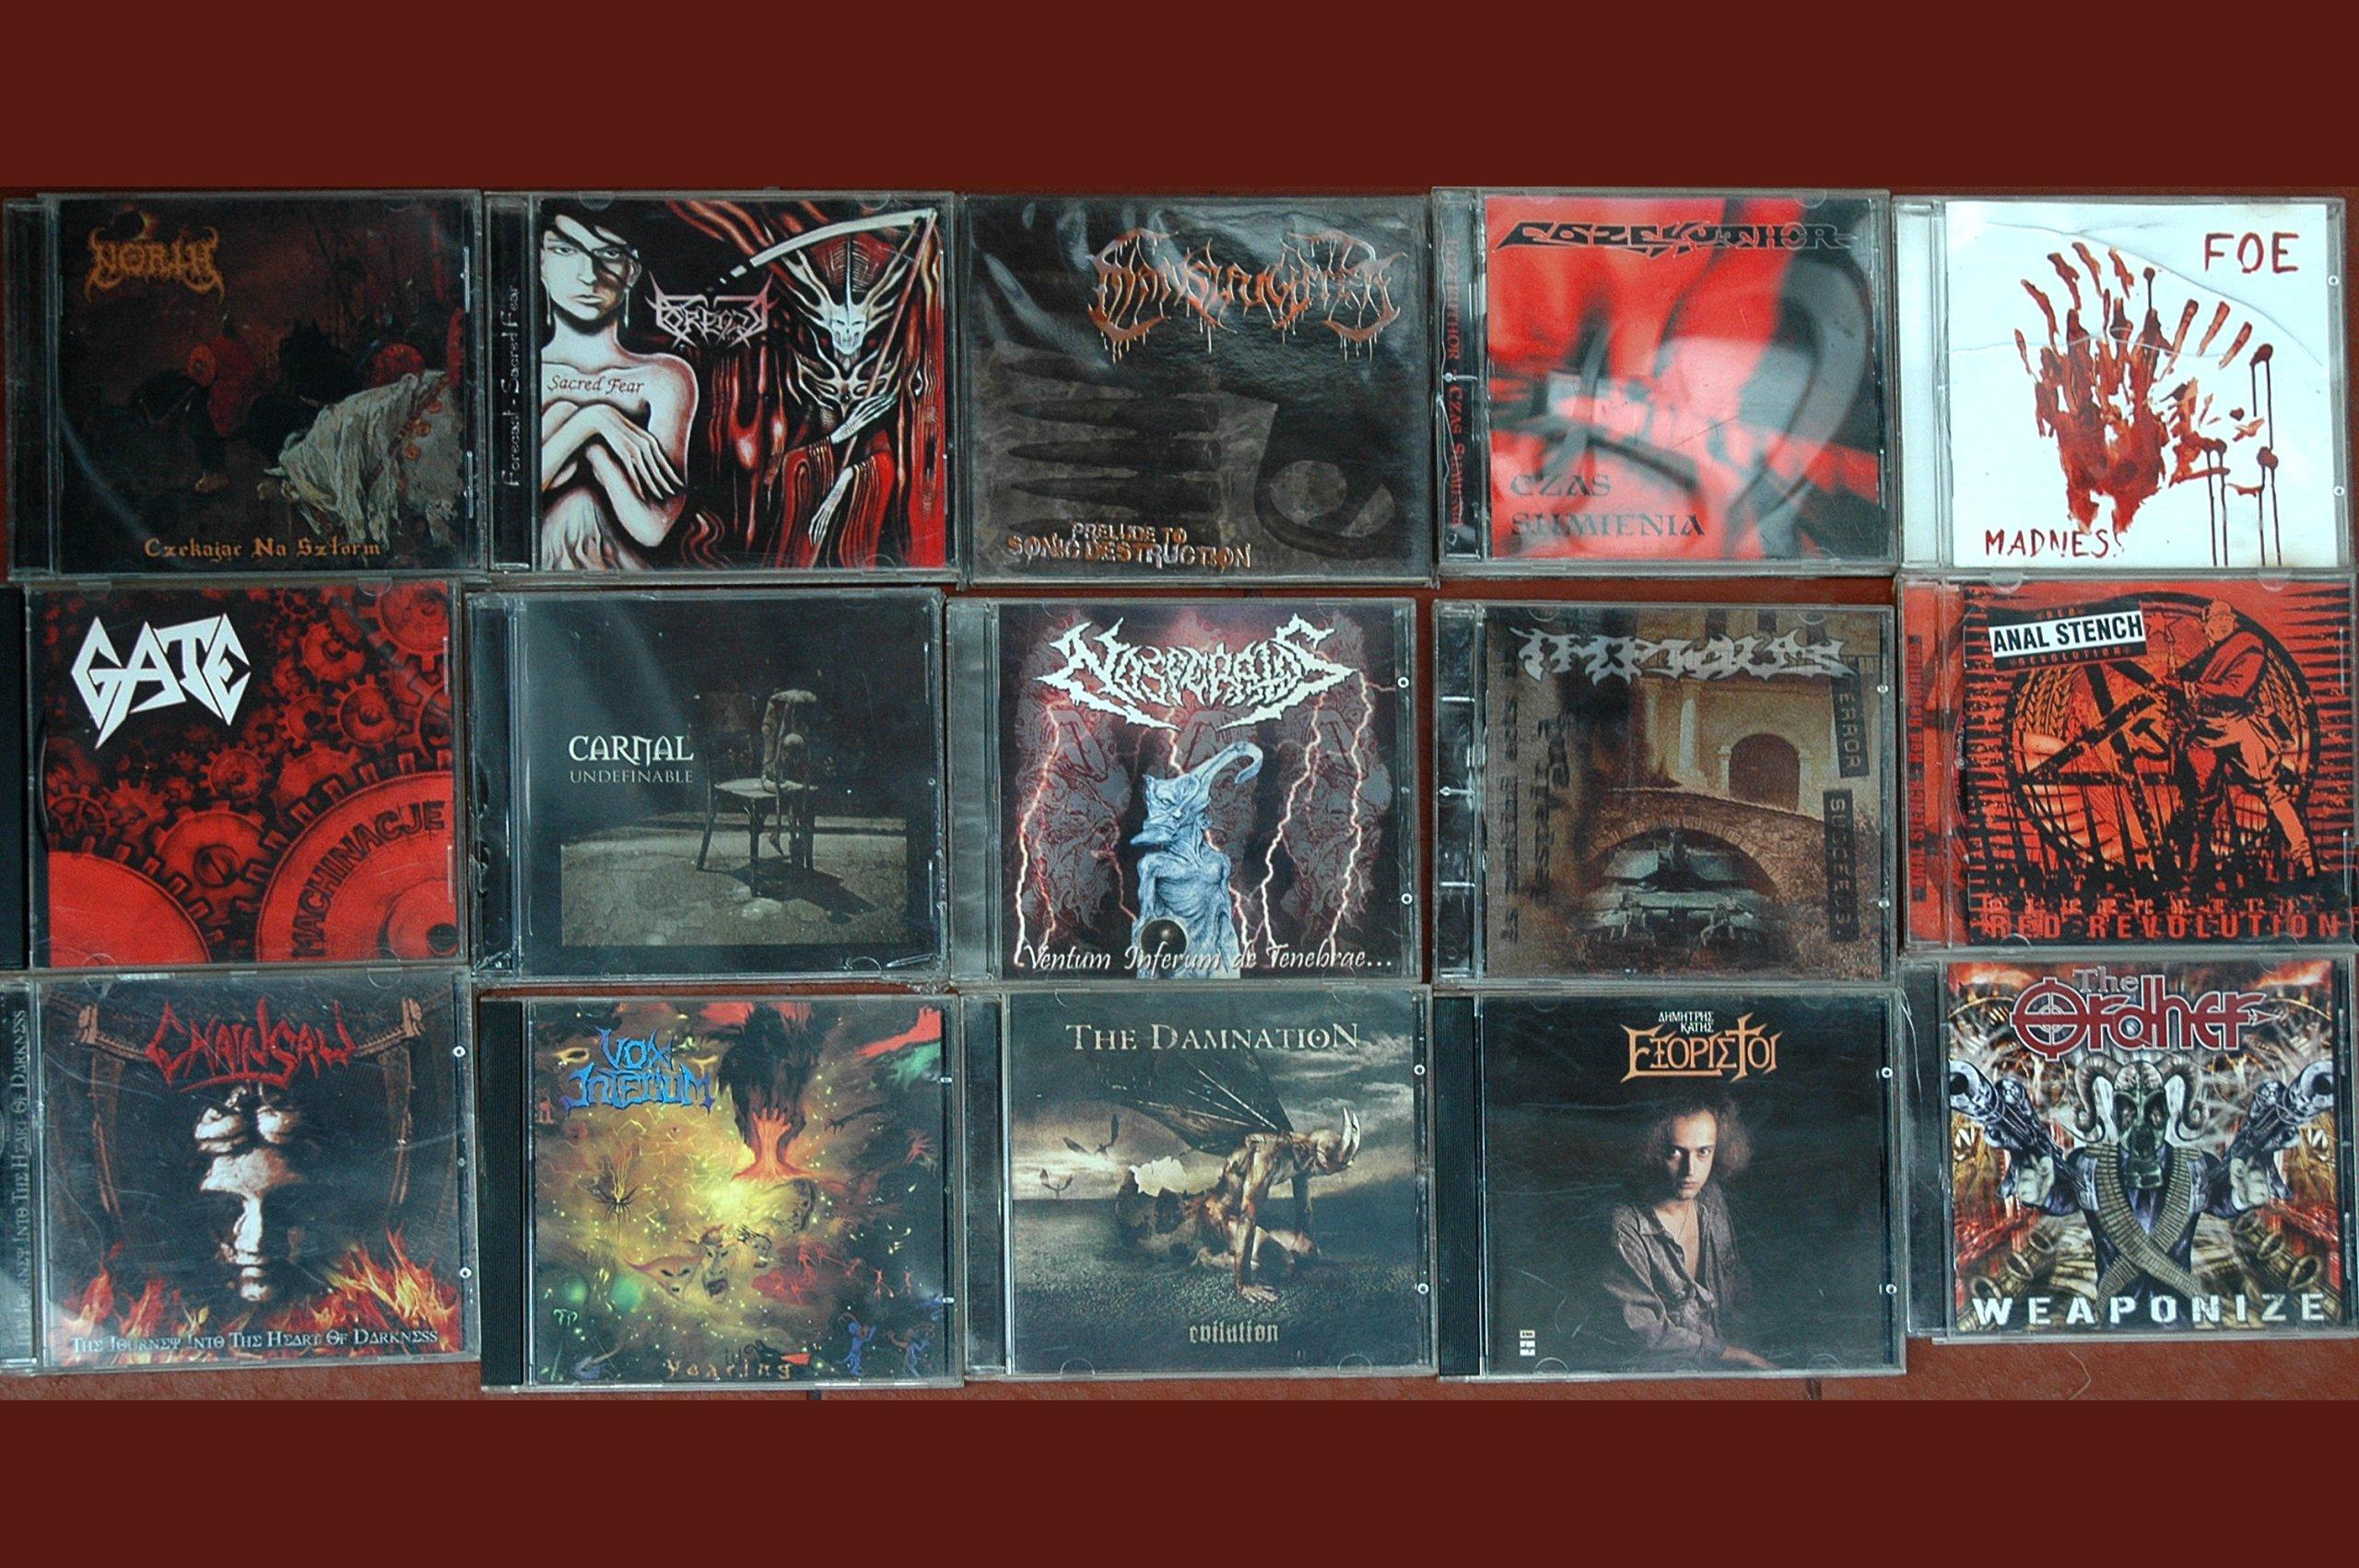 Metal Black Metal Kolekcja Plyt Cd 255 Szt 7016254962 Oficjalne Archiwum Allegro